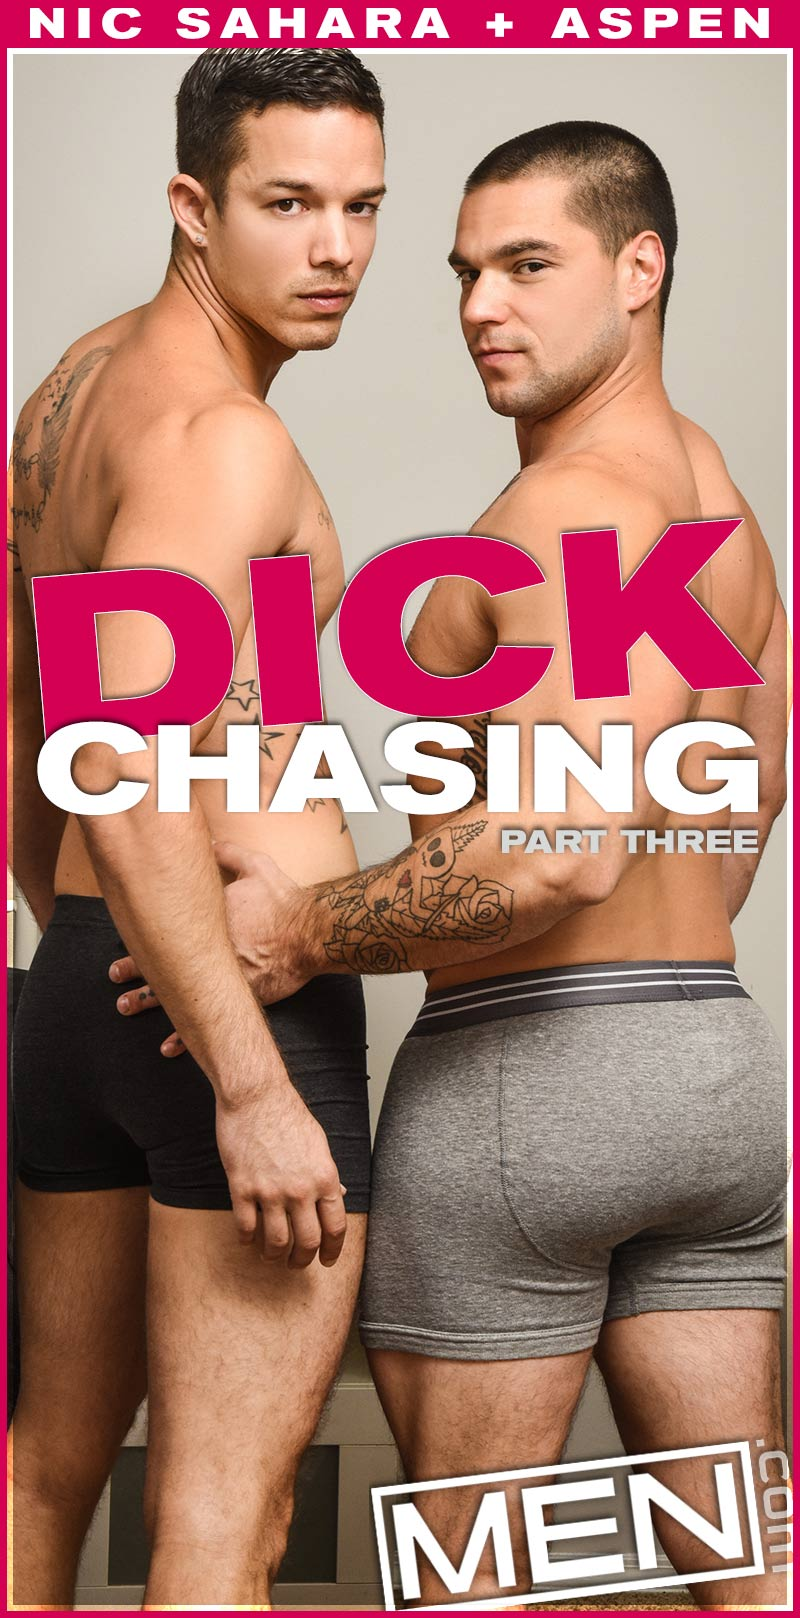 Dick Chasing, Part Three (Aspen and Nic Sahara Flip-Fuck) at Drill My Hole